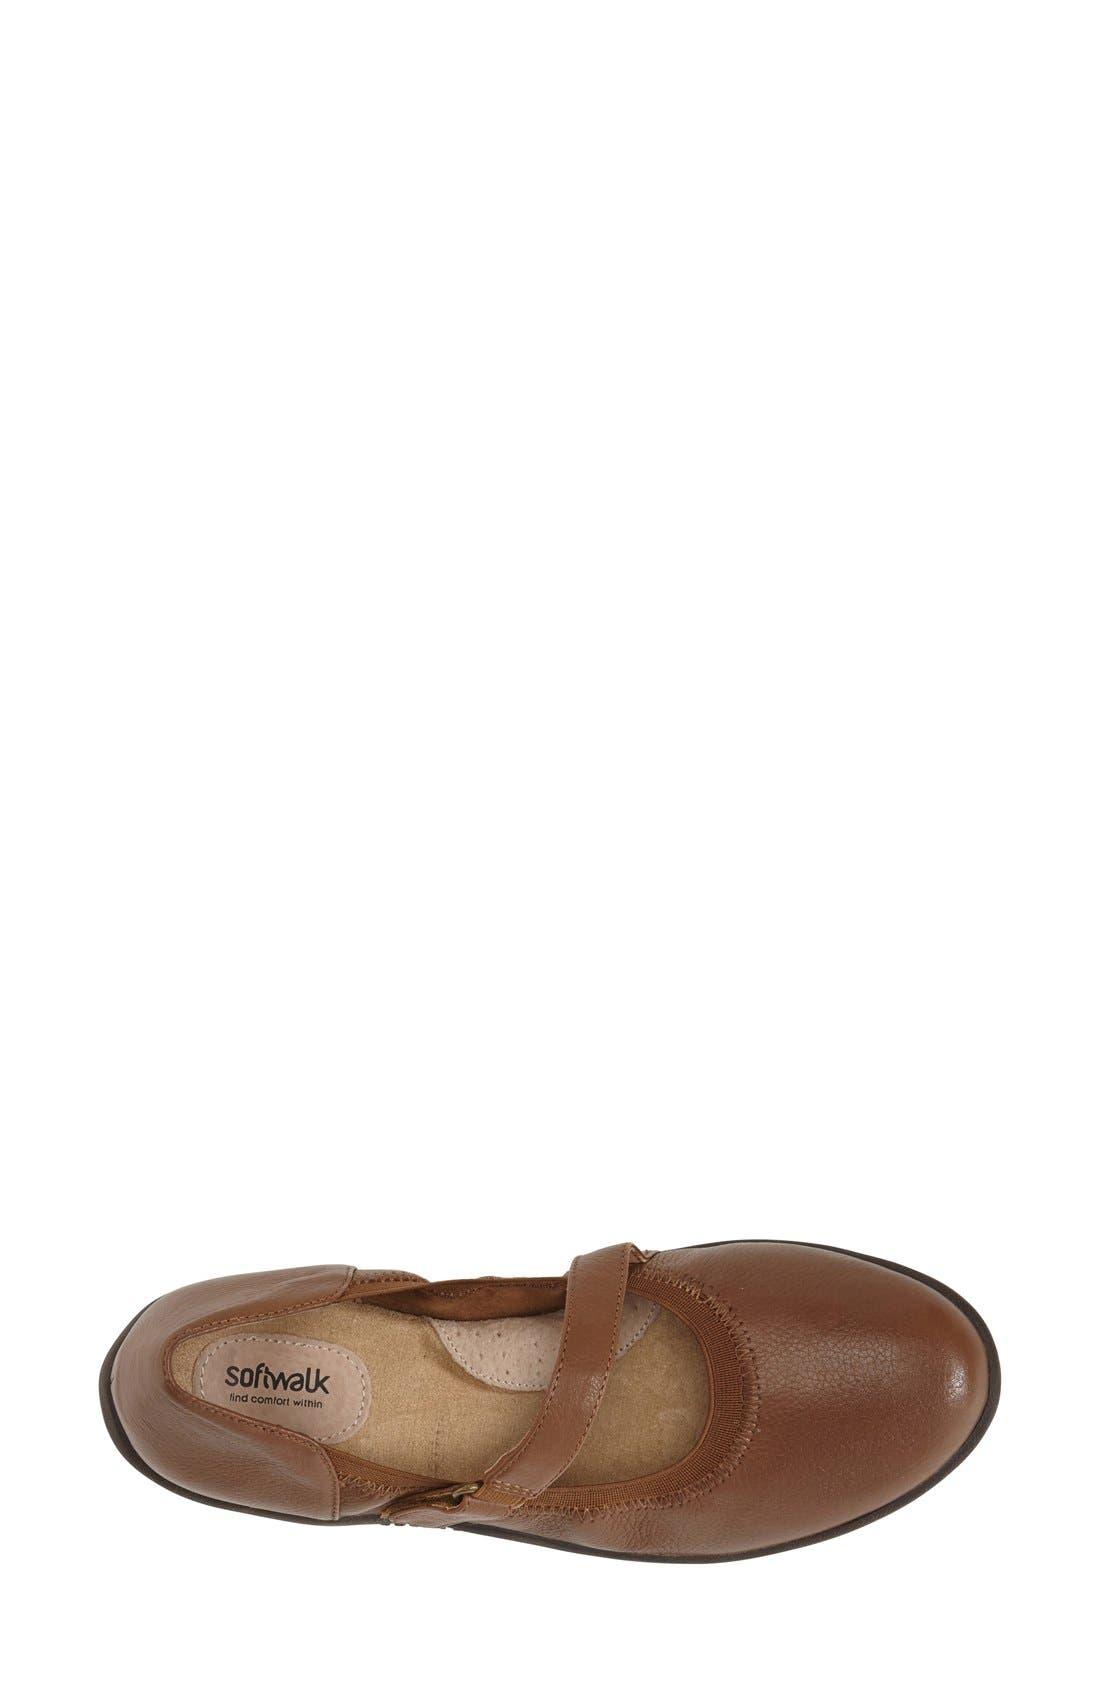 'Hollis' Mary Jane Flat,                             Alternate thumbnail 3, color,                             Luggage